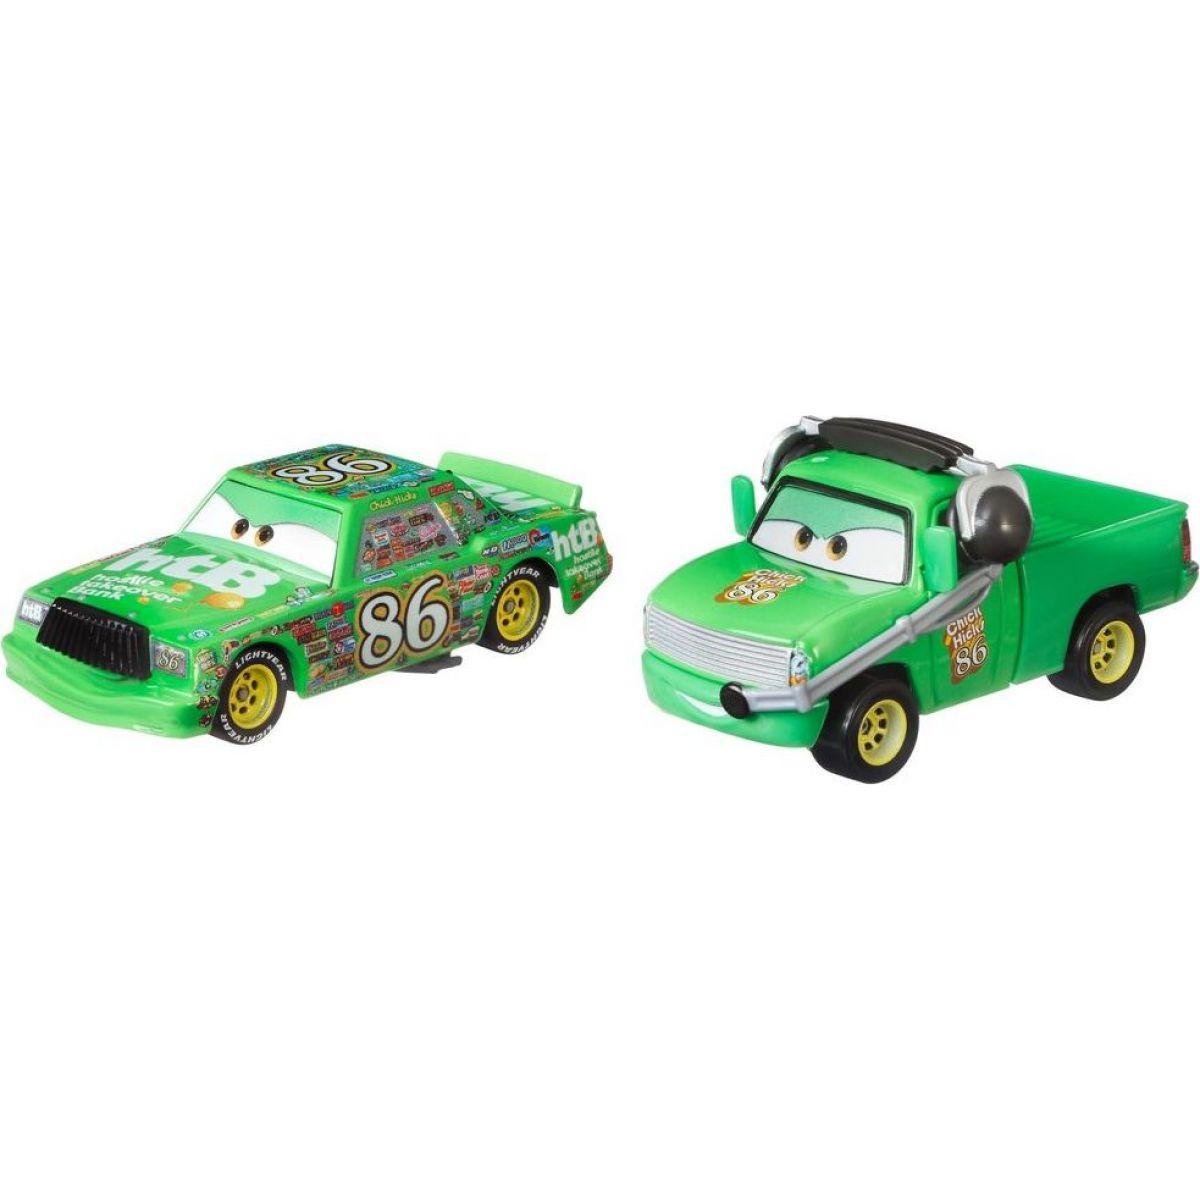 Mattel Cars 3 auta 2 ks Chick Hicks a Jefe Chick